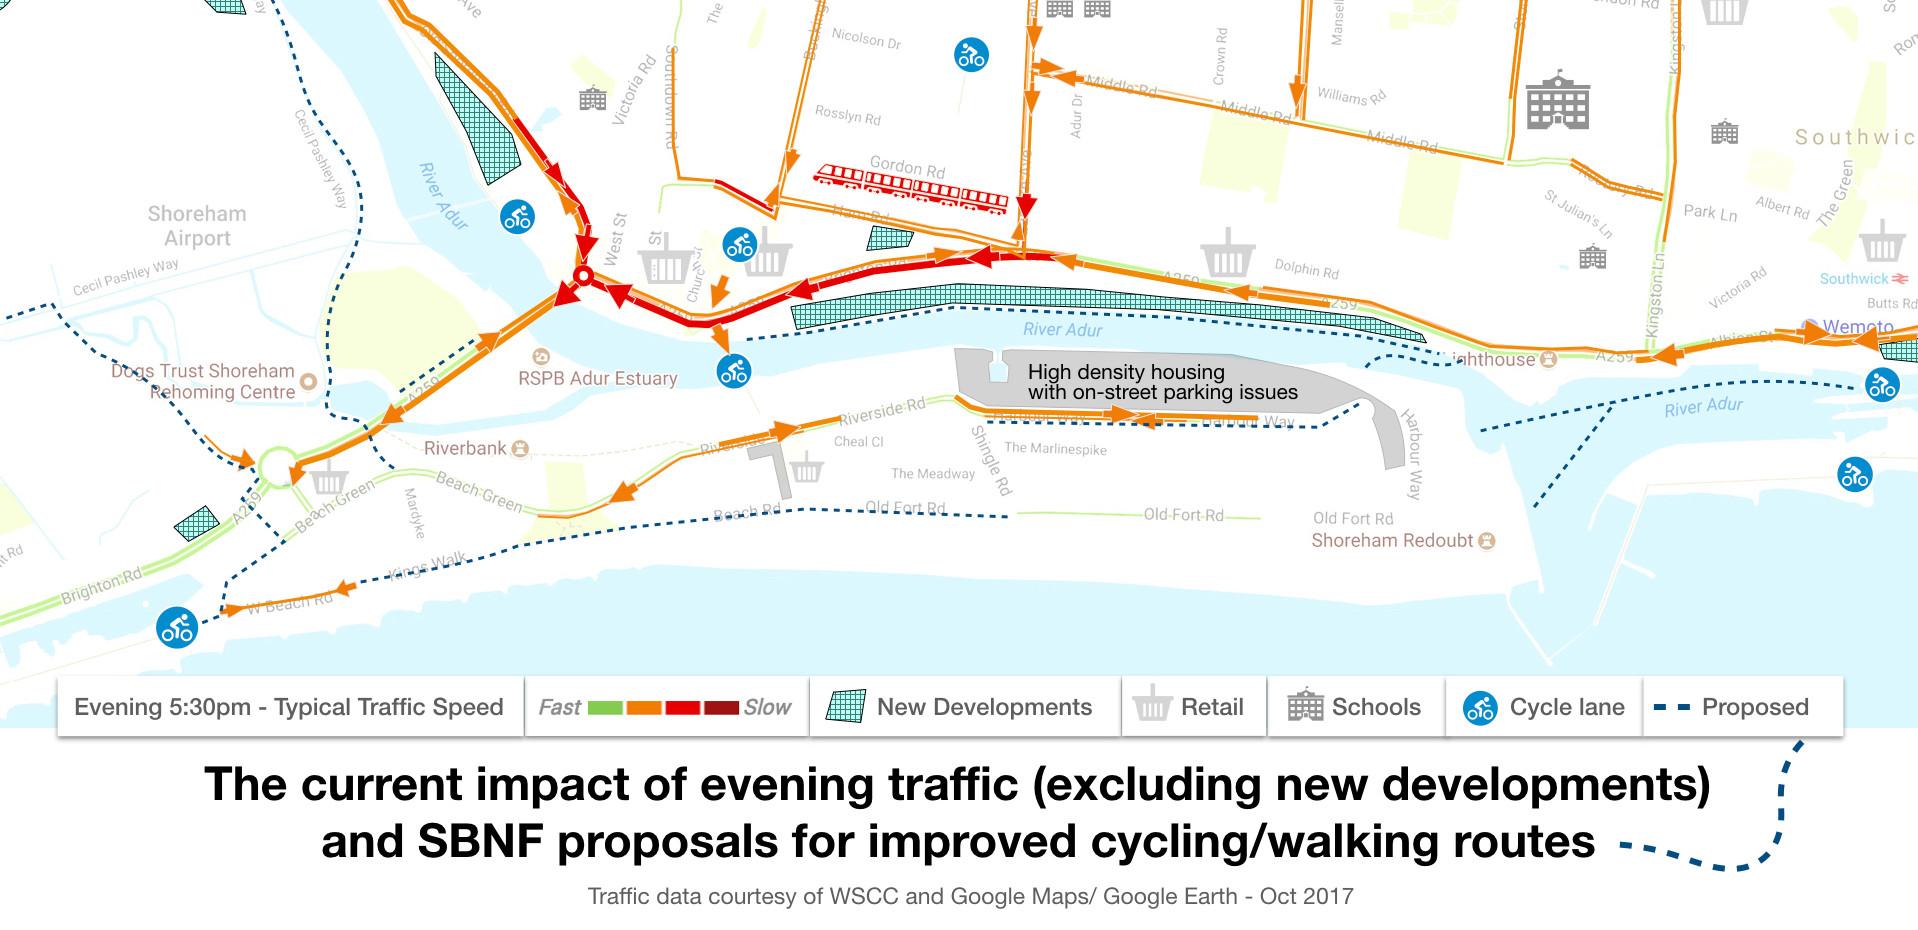 See the plans for Shoreham Harbour at Pond Rd: 10 Nov-22nd December